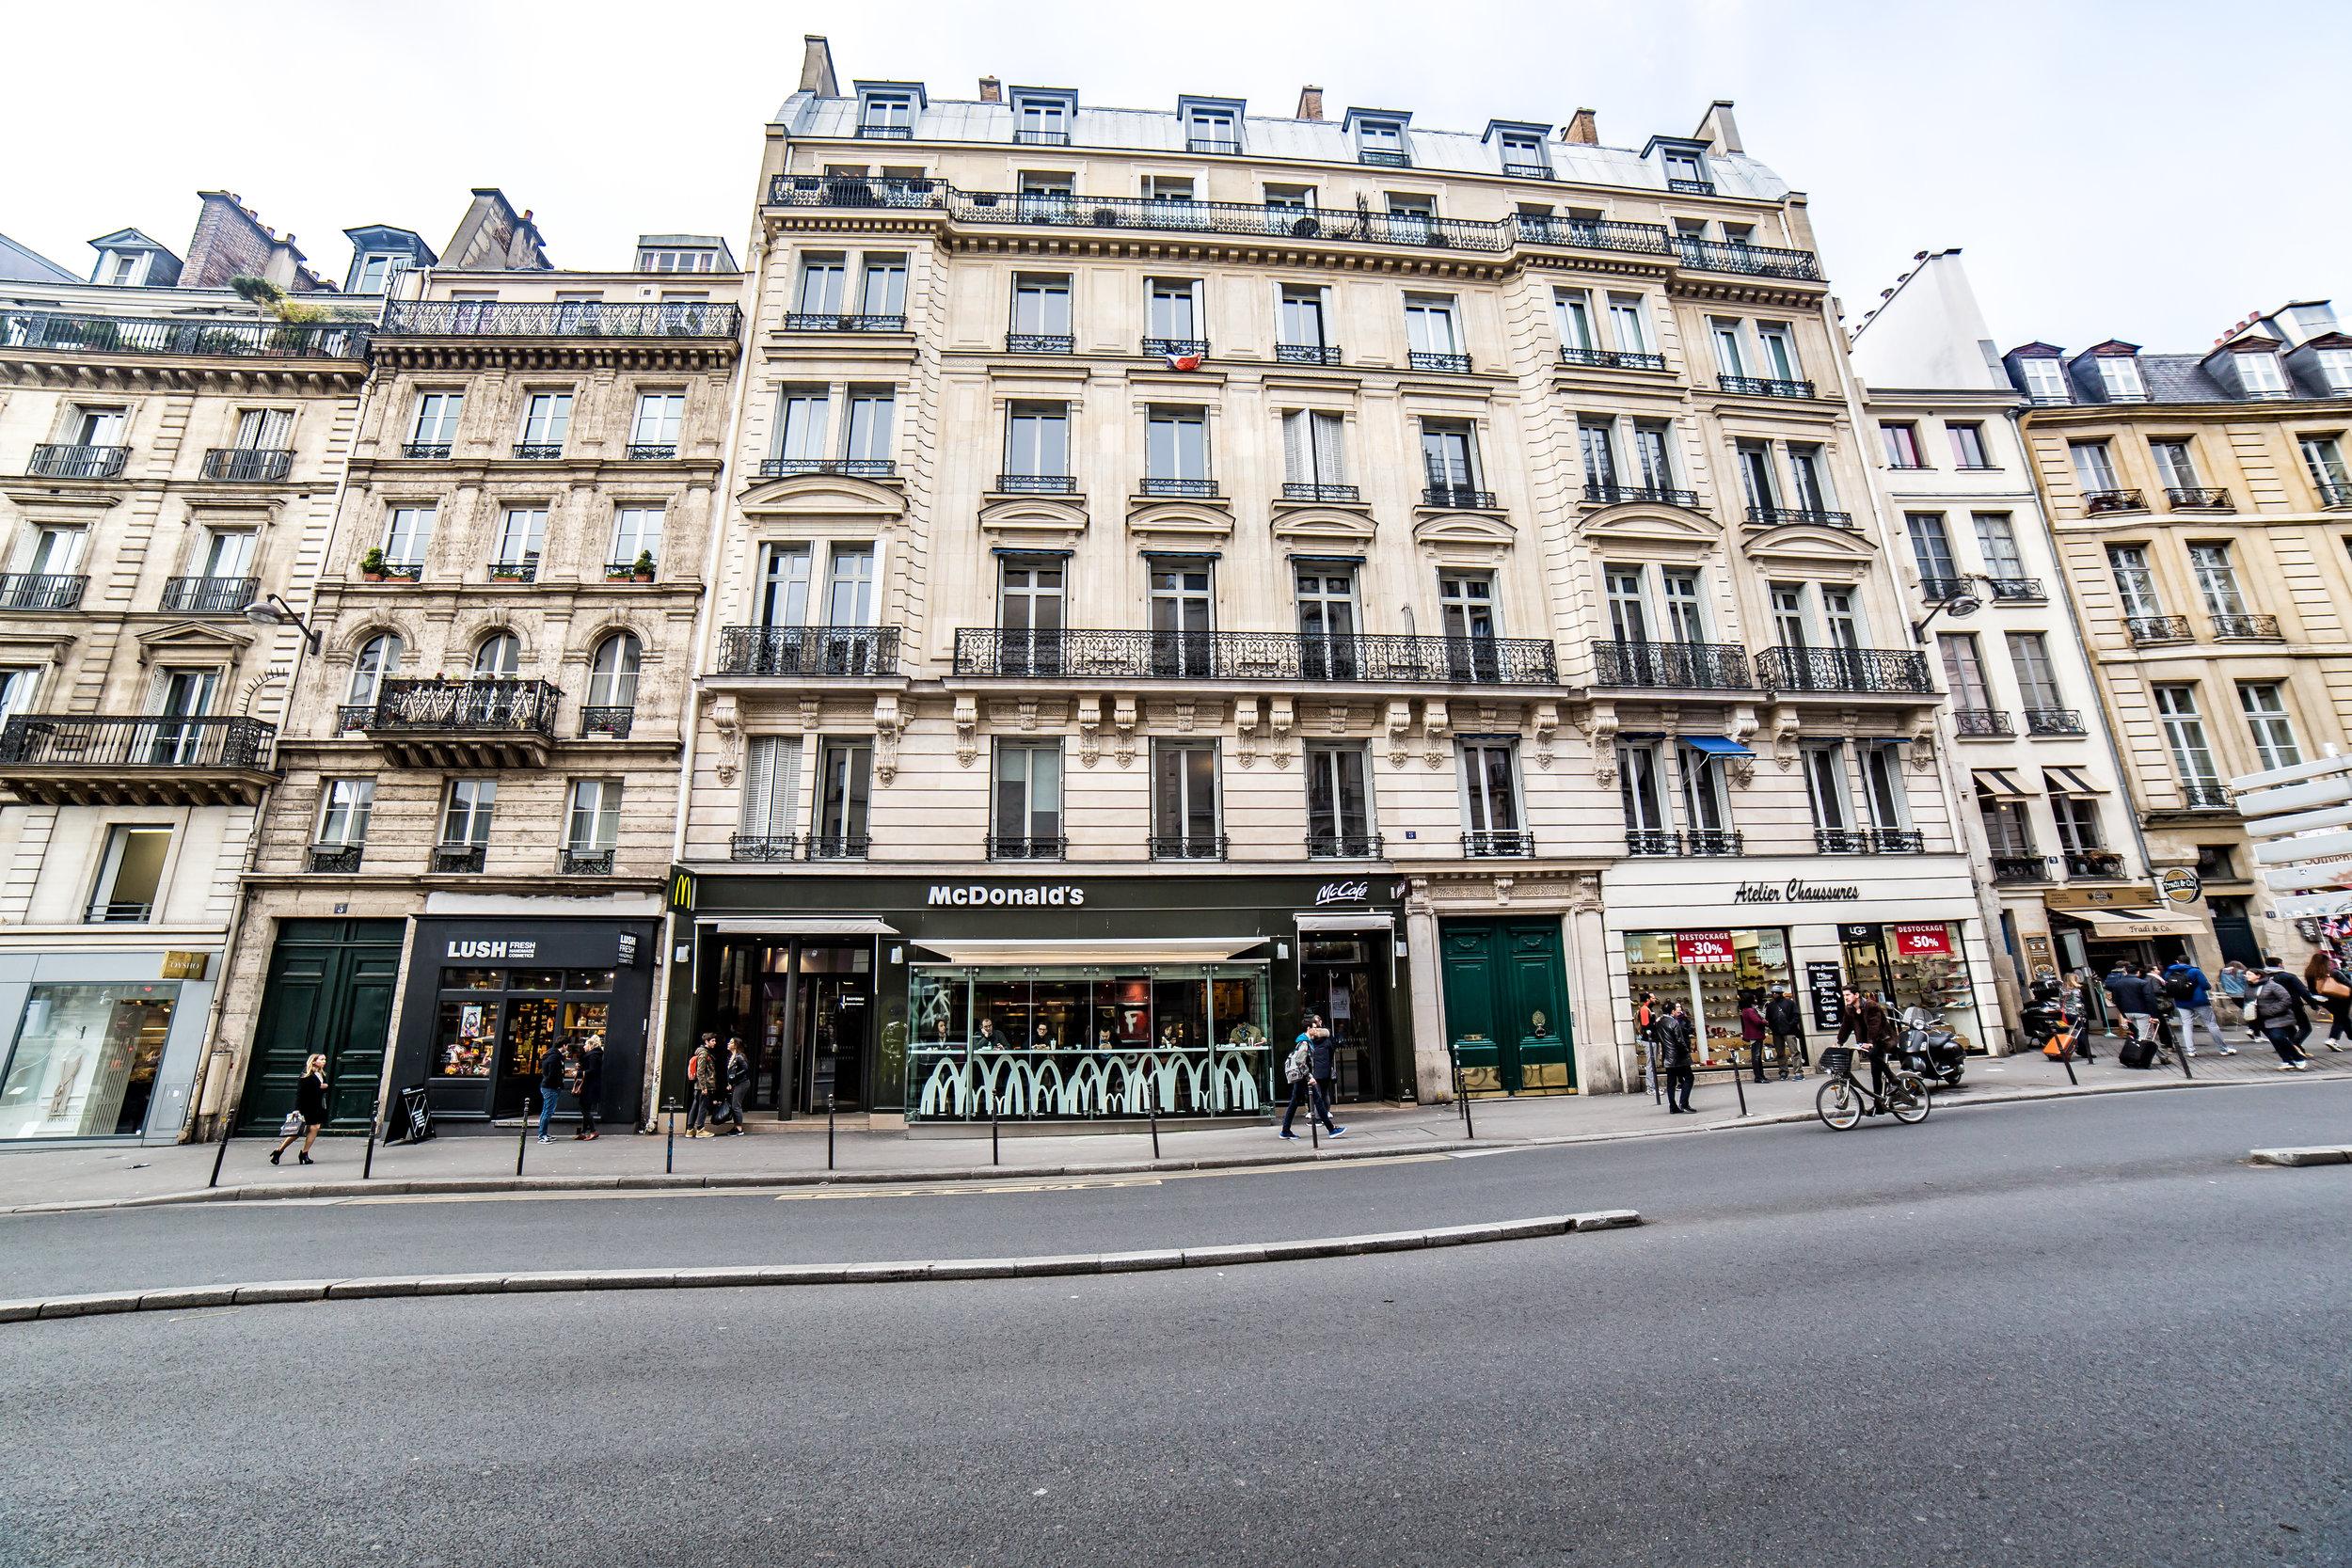 paris2017-9707.jpg